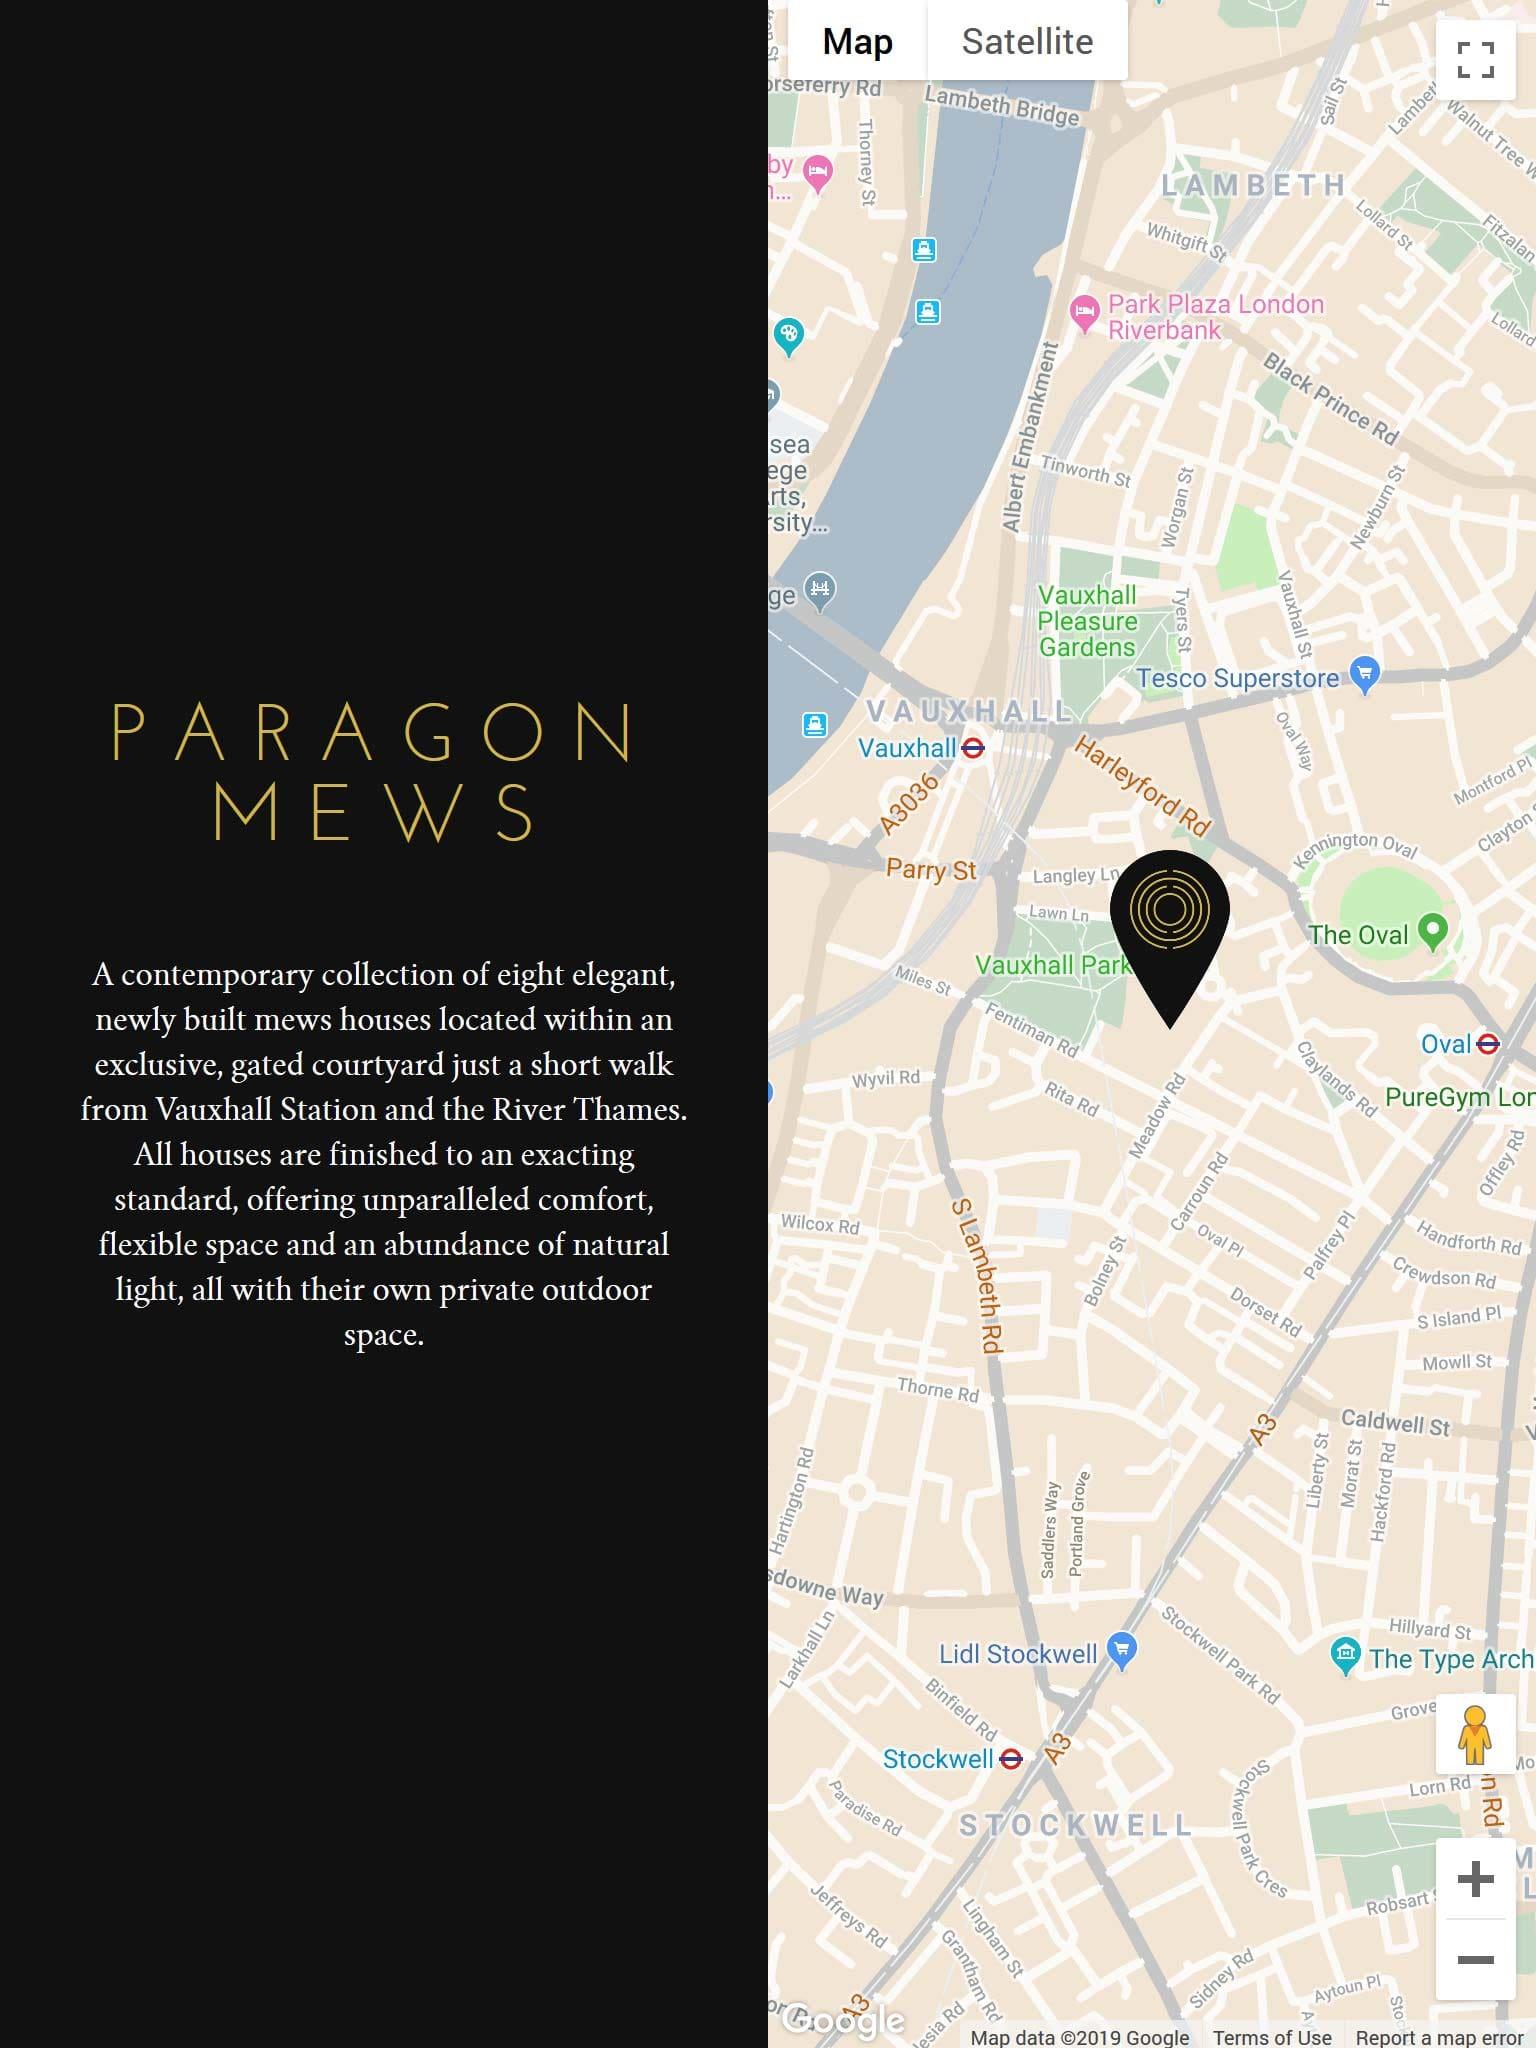 Paragon Mews